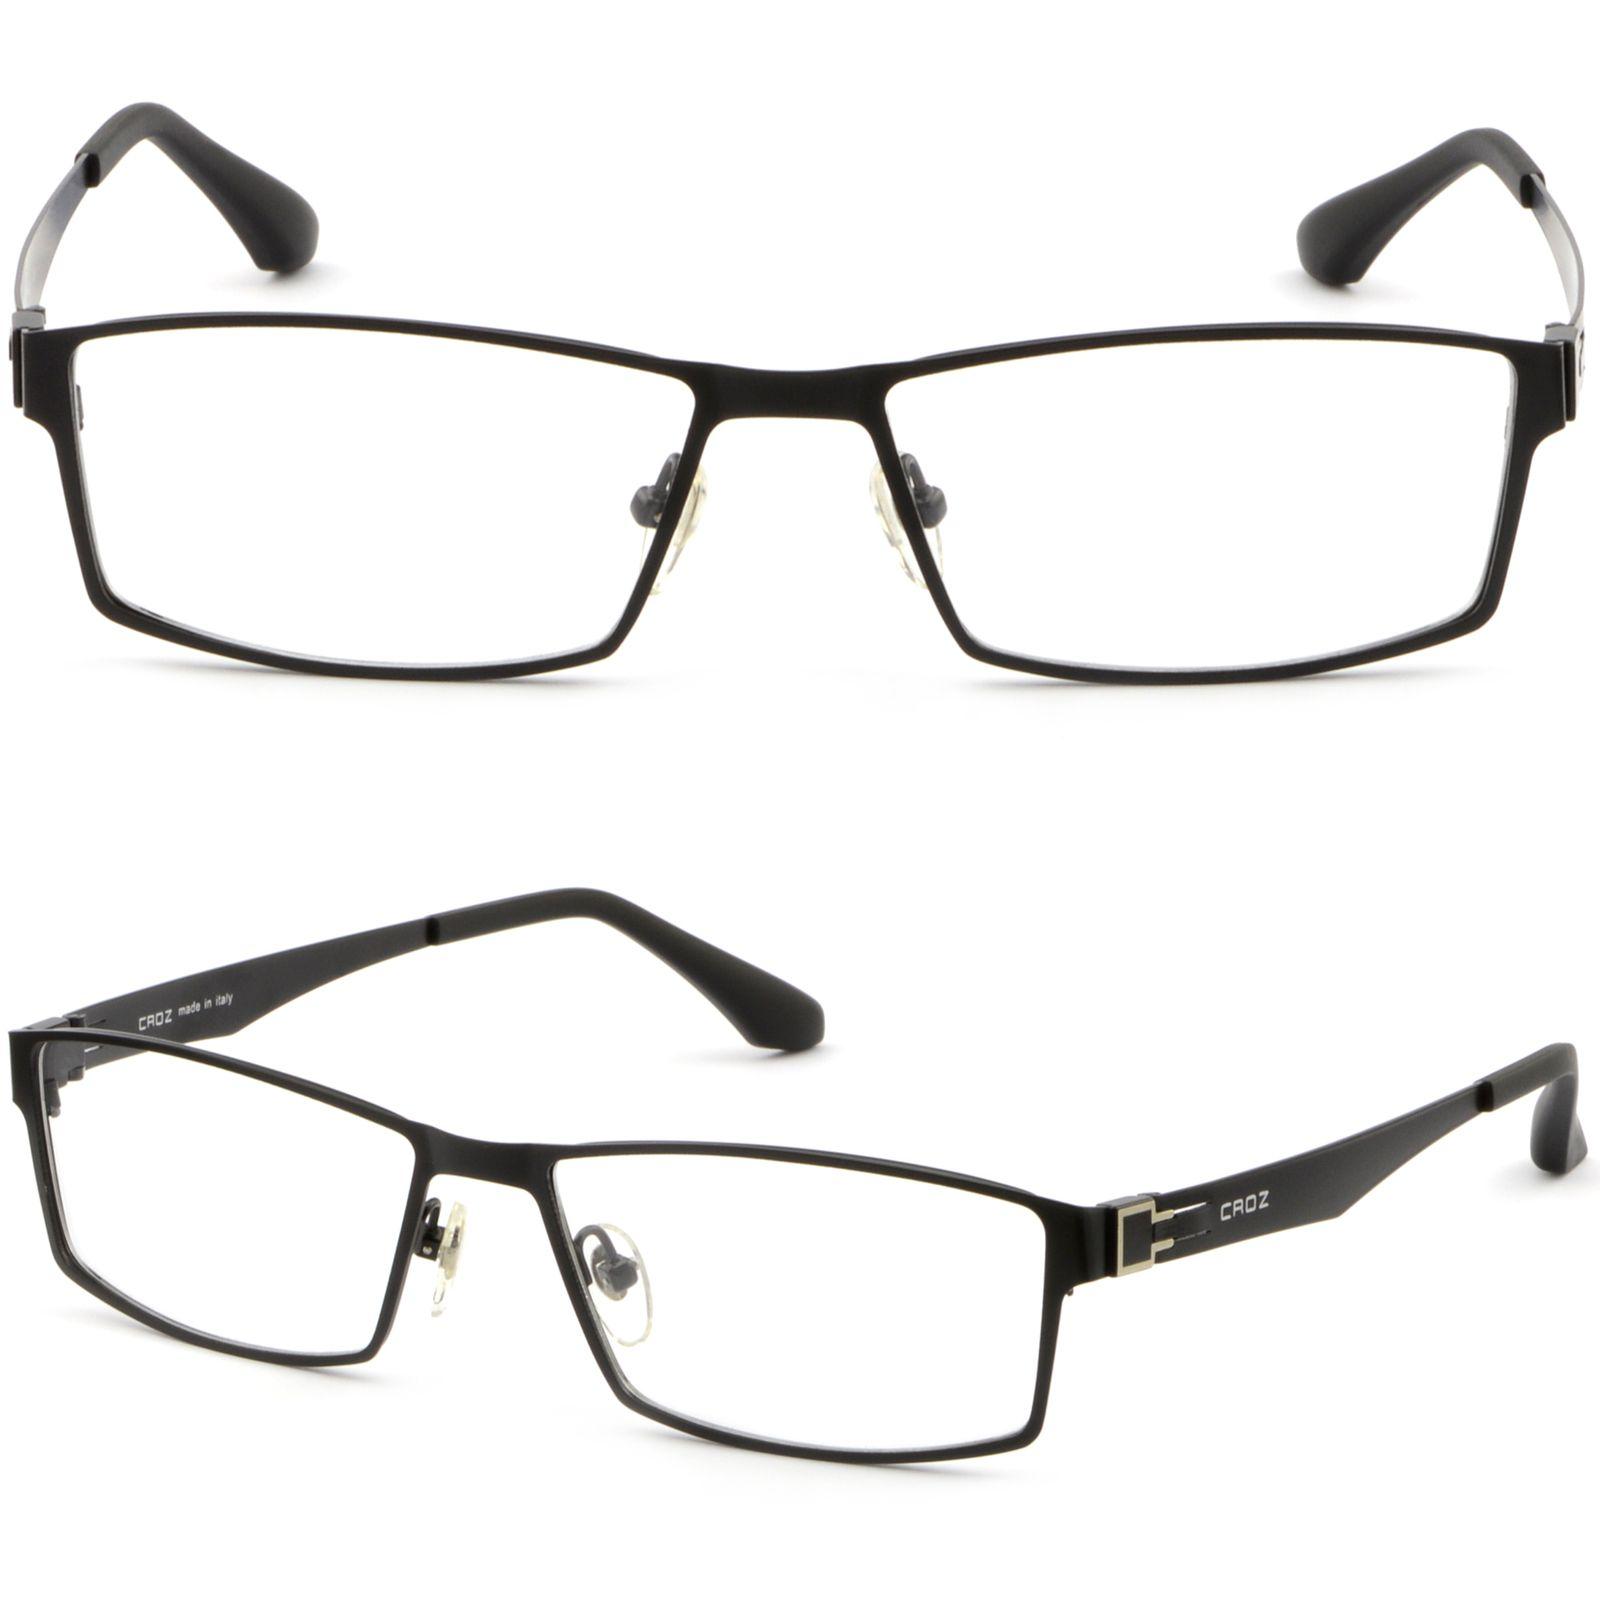 black light men titanium alloy frame rectangular prescription glasses sunglasses wide eyeglass frames women eyeglass frames from aceglasses 3011 dhgate - Wide Eyeglass Frames